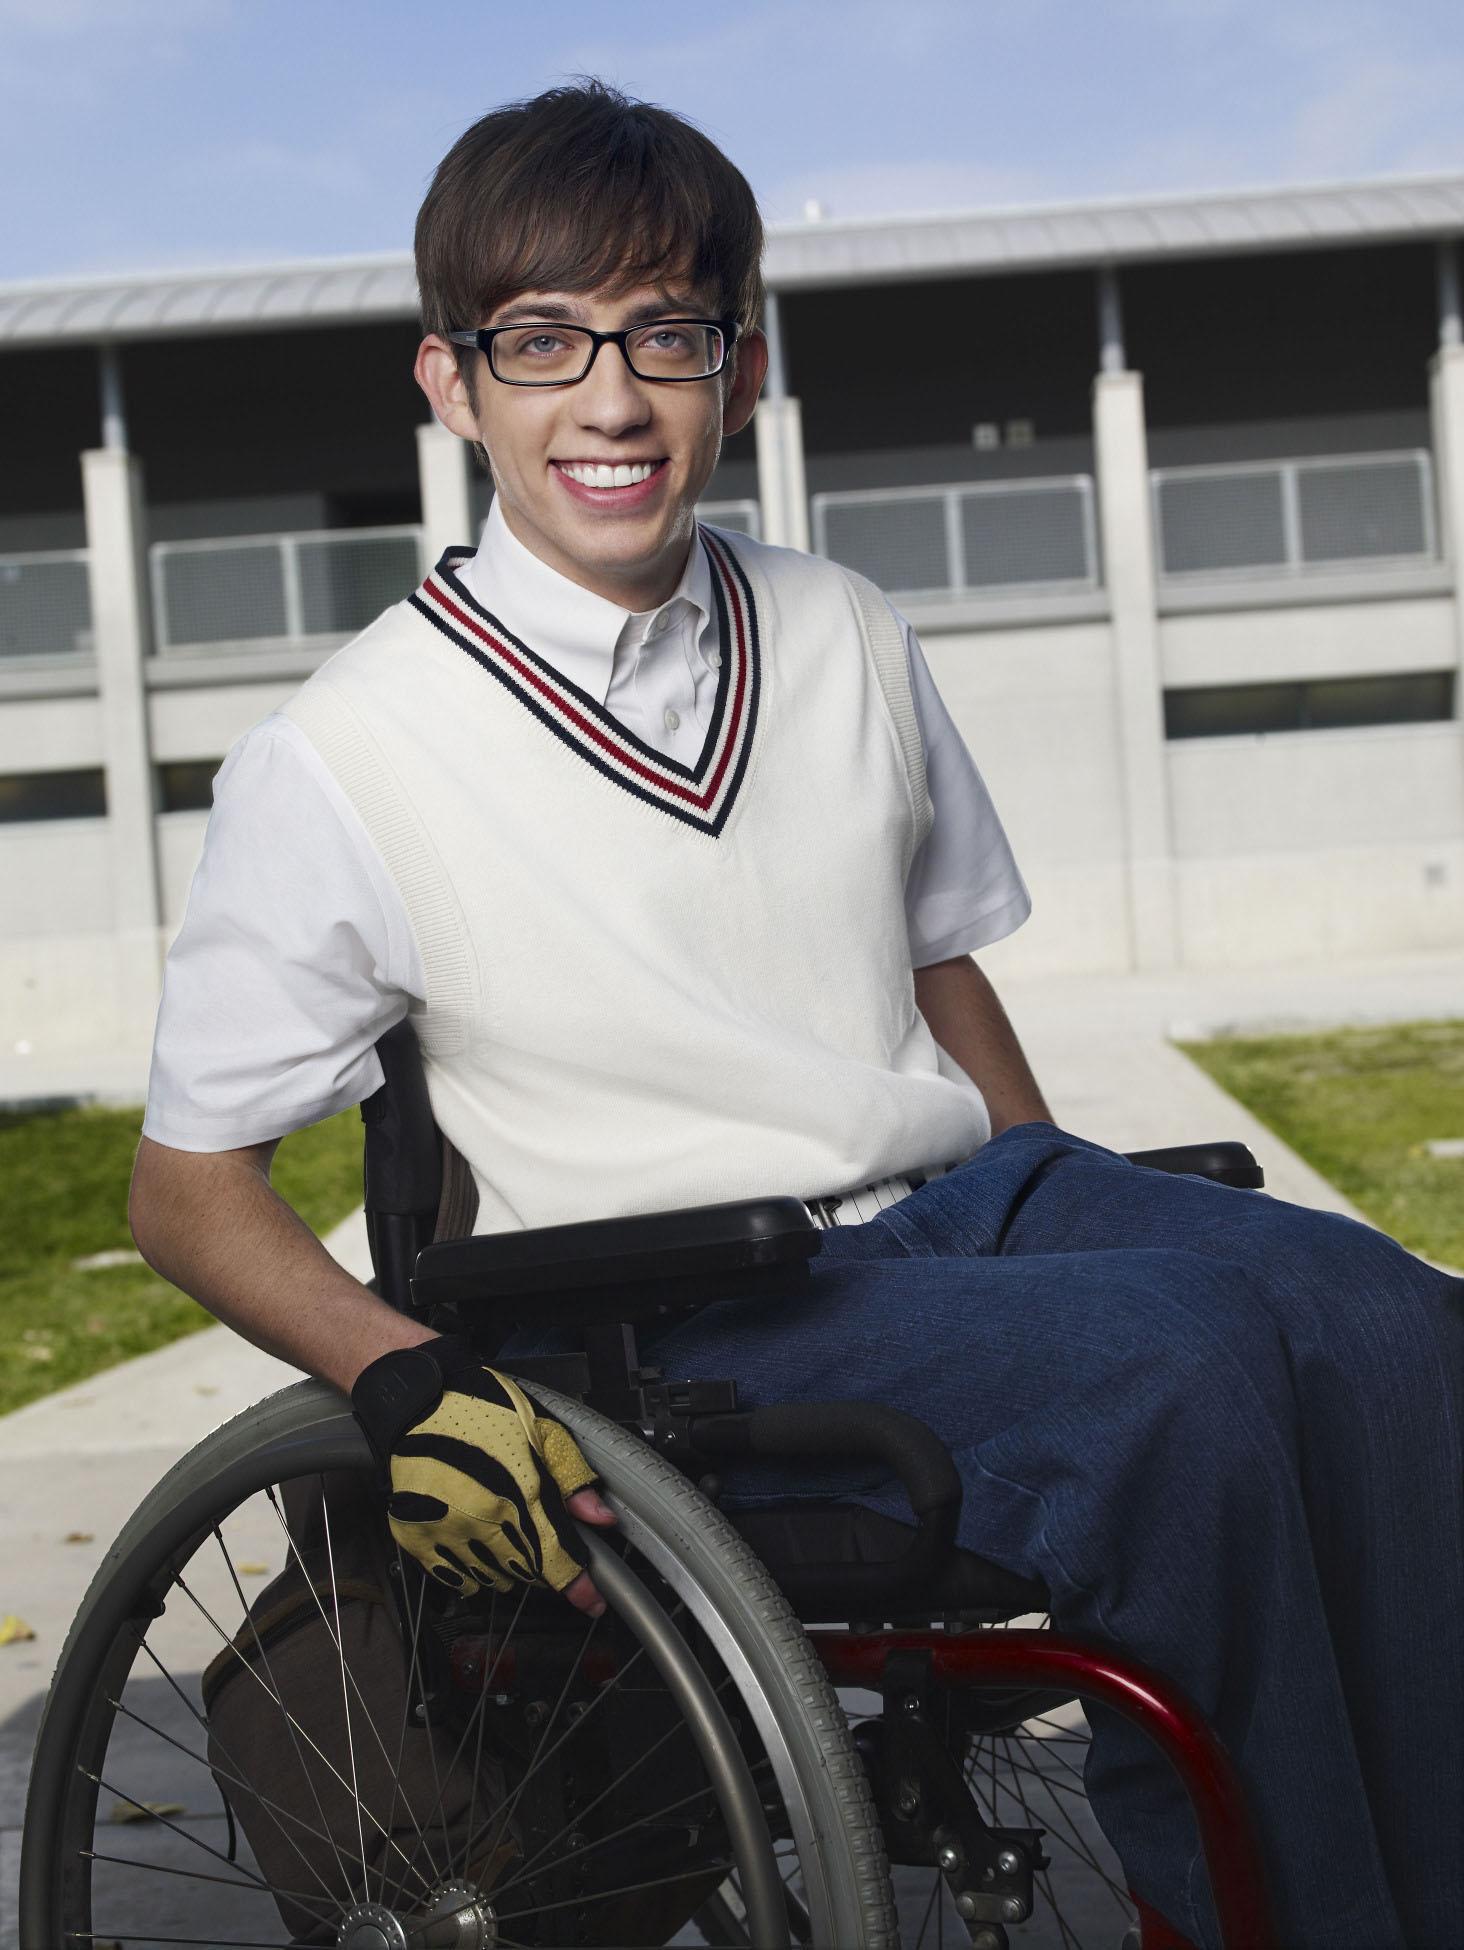 Glee : Artie Abrams